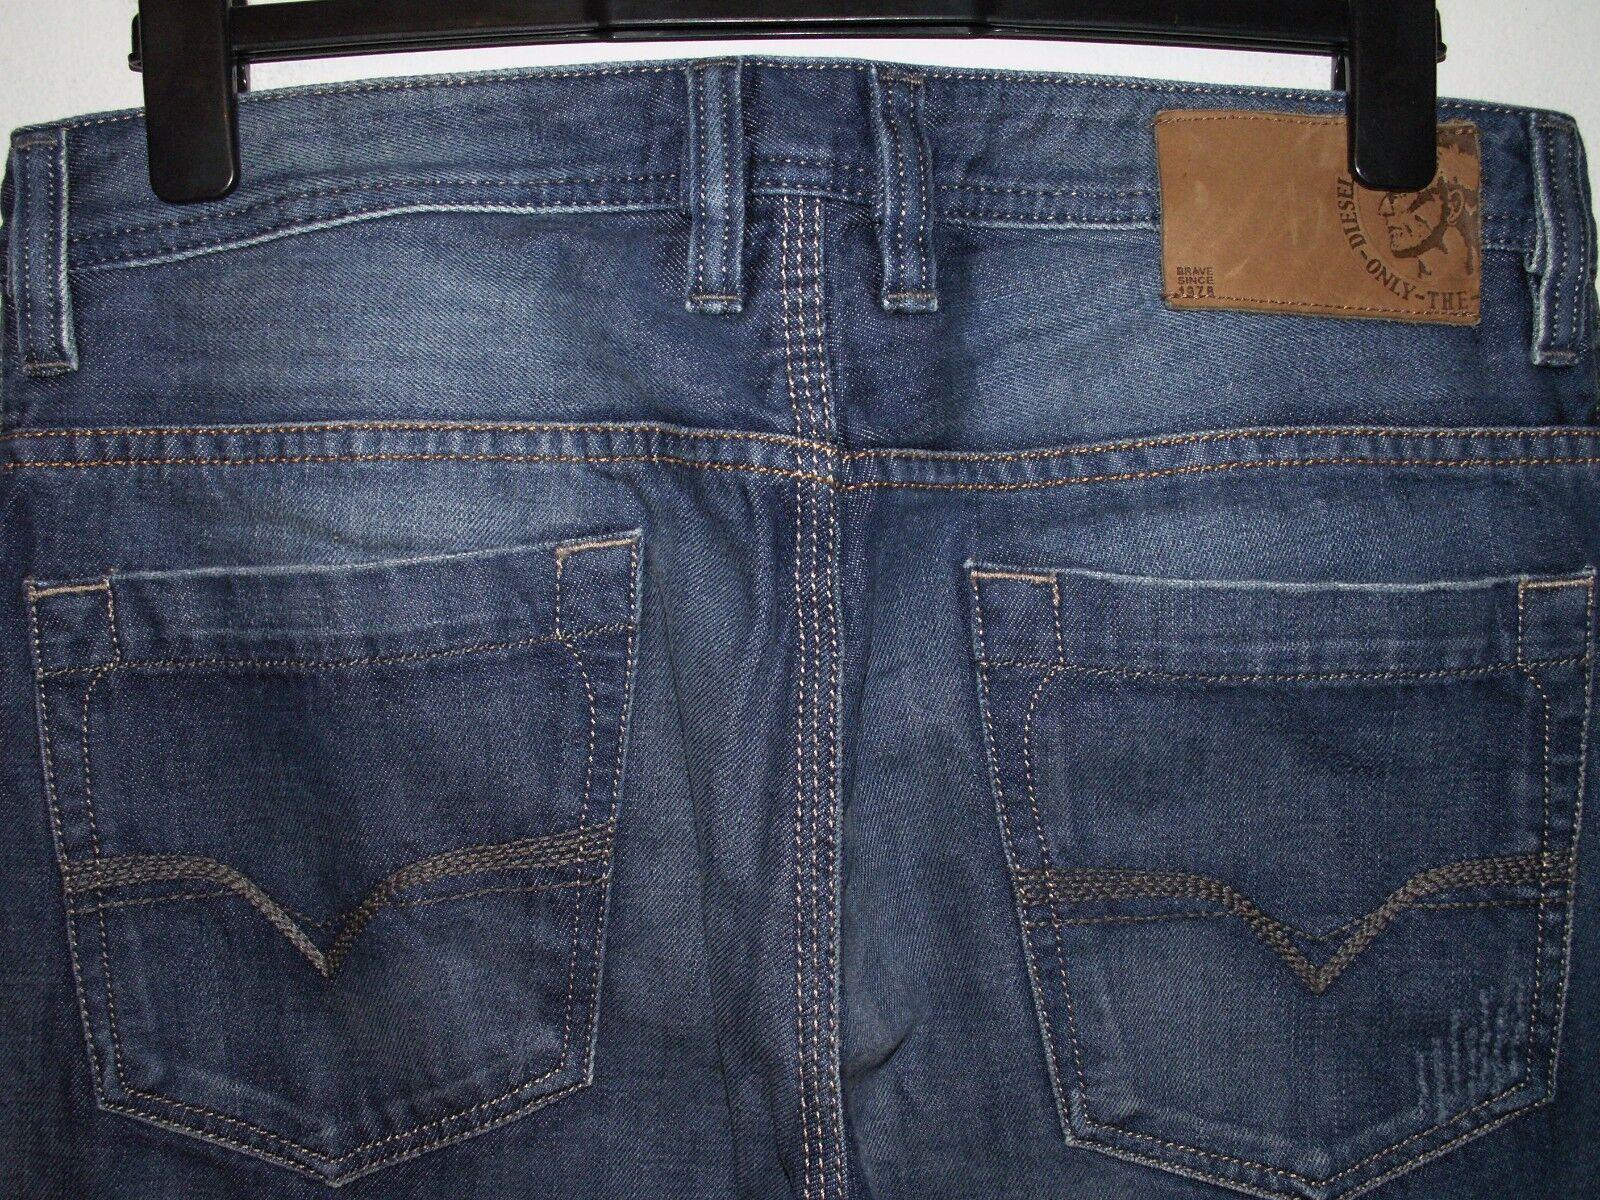 Diesel koffha bootcut jeans wash 008BK W32 L30 (a2817)